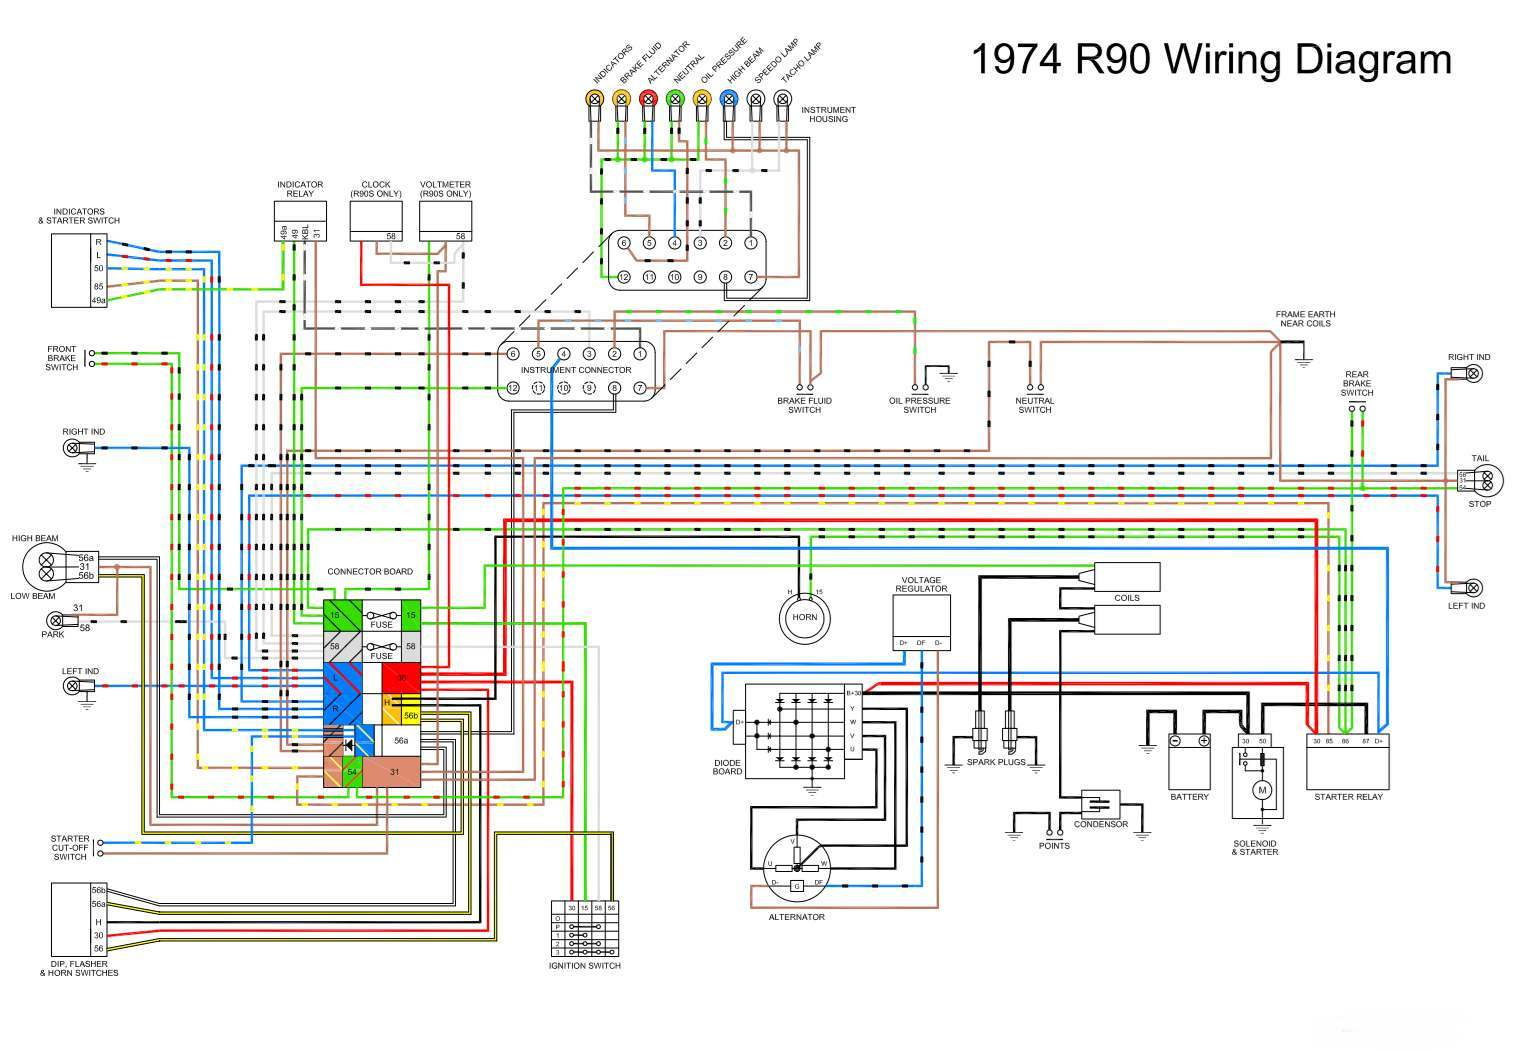 fantastic big dog motorcycle wiring diagrams image electrical rh piotomar info Freightliner Wiring Schematics Simple Wiring Schematics 1990 Lexus